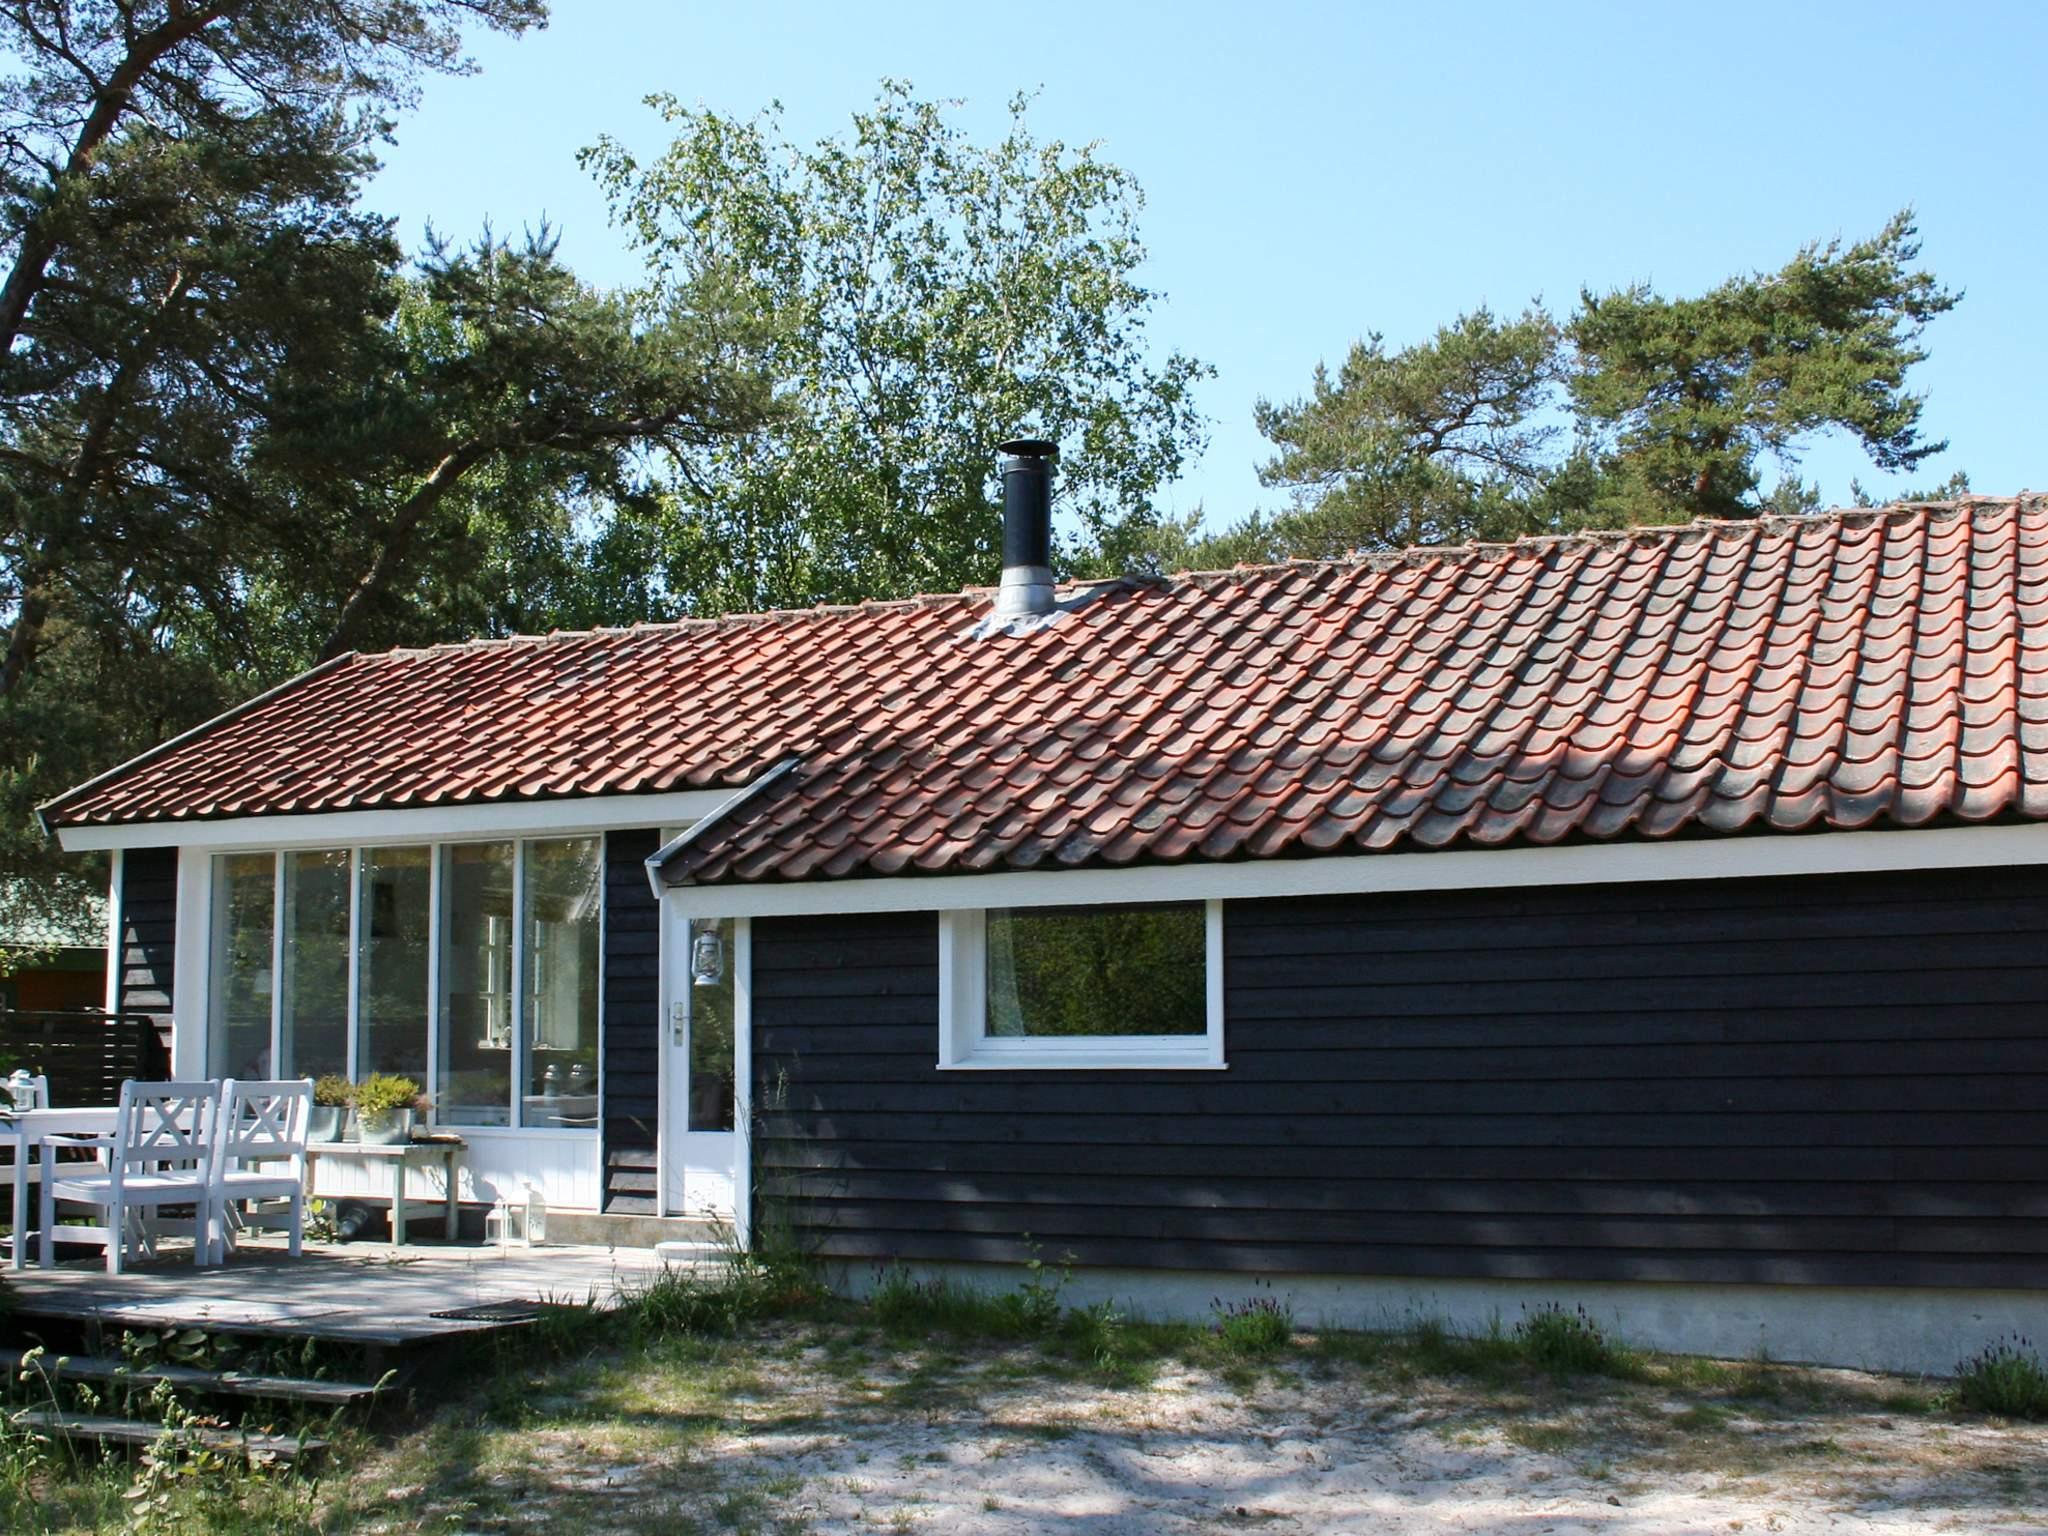 Ferienhaus Balka Strand (82298), Balke, , Bornholm, Dänemark, Bild 6